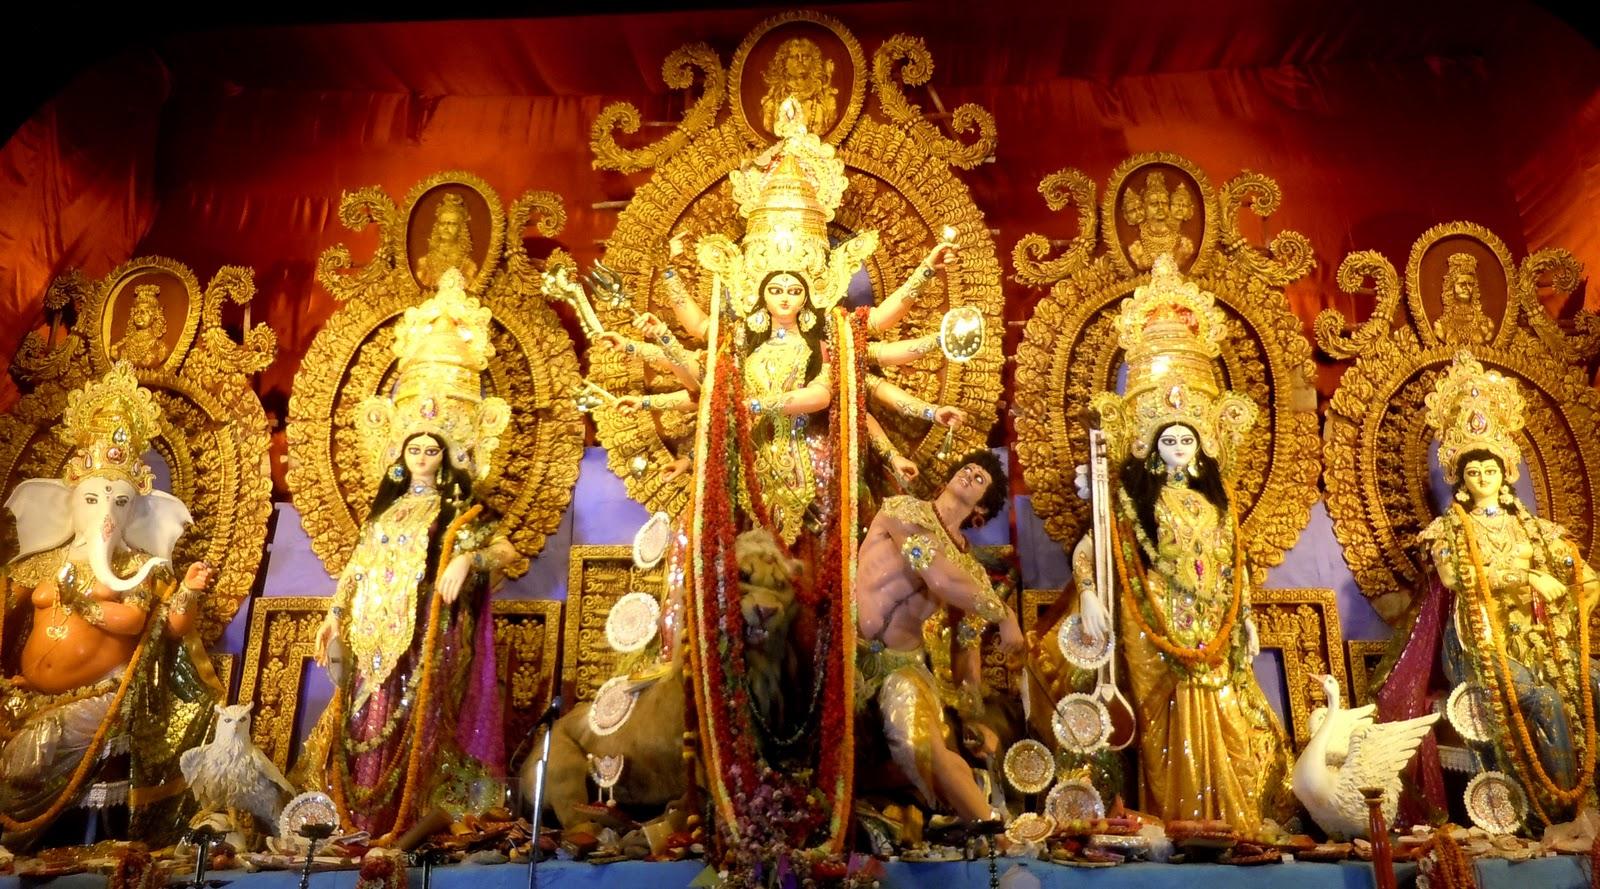 durga puja 2 essay Durga puja essay, essays on durga pooja, send your essay on durga puja,compose your essays on durga puja, submit your essays on durga puja, occasion of durga pooja, durga pooja time, durga puja 2018, goddess durga, durga pooja festival, durga puja india, durga pooja, durga puja festival, durga puja traditions, durga puja celebrations, durga.